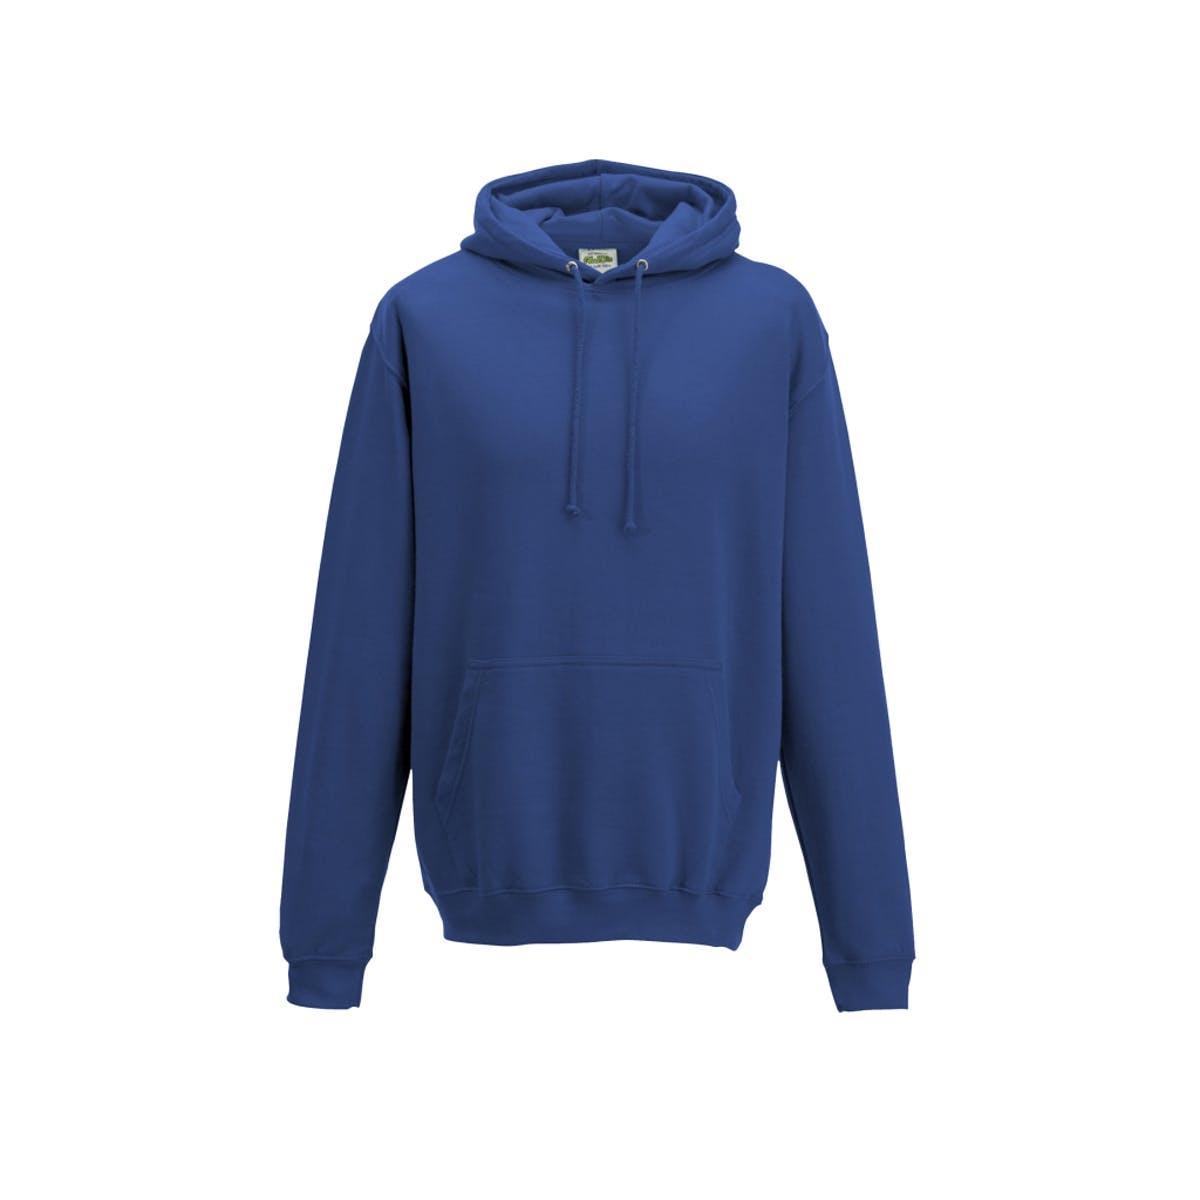 tropical blue college hoodies